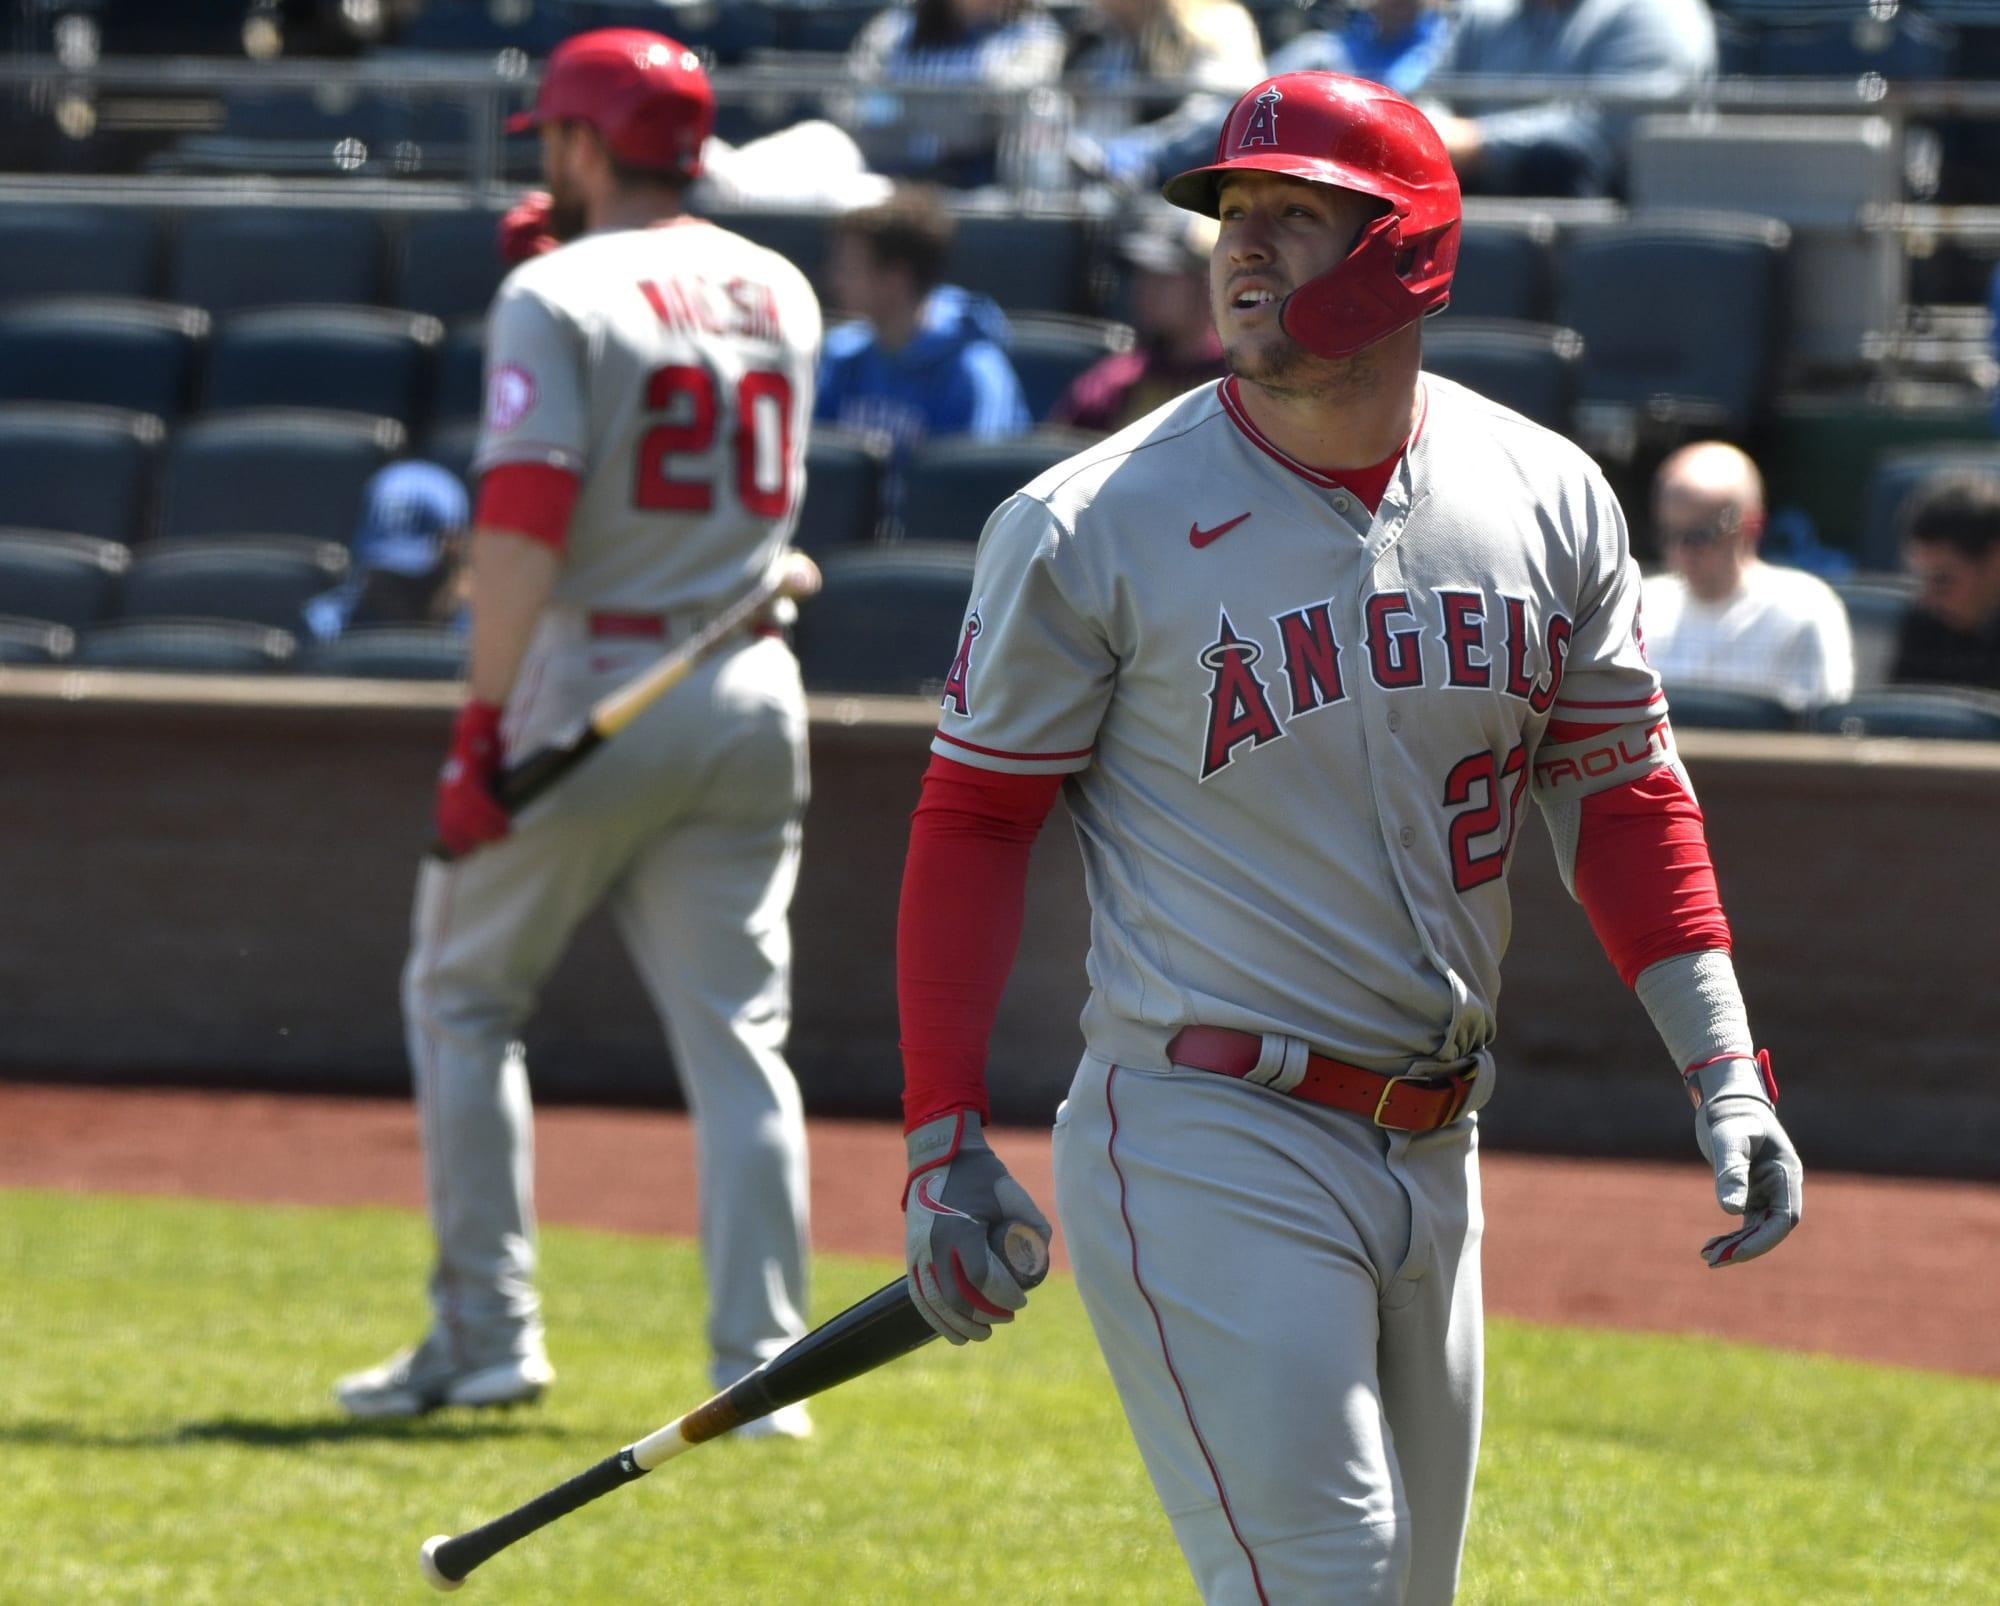 LA Angels: Halos offensive numbers are deceiving